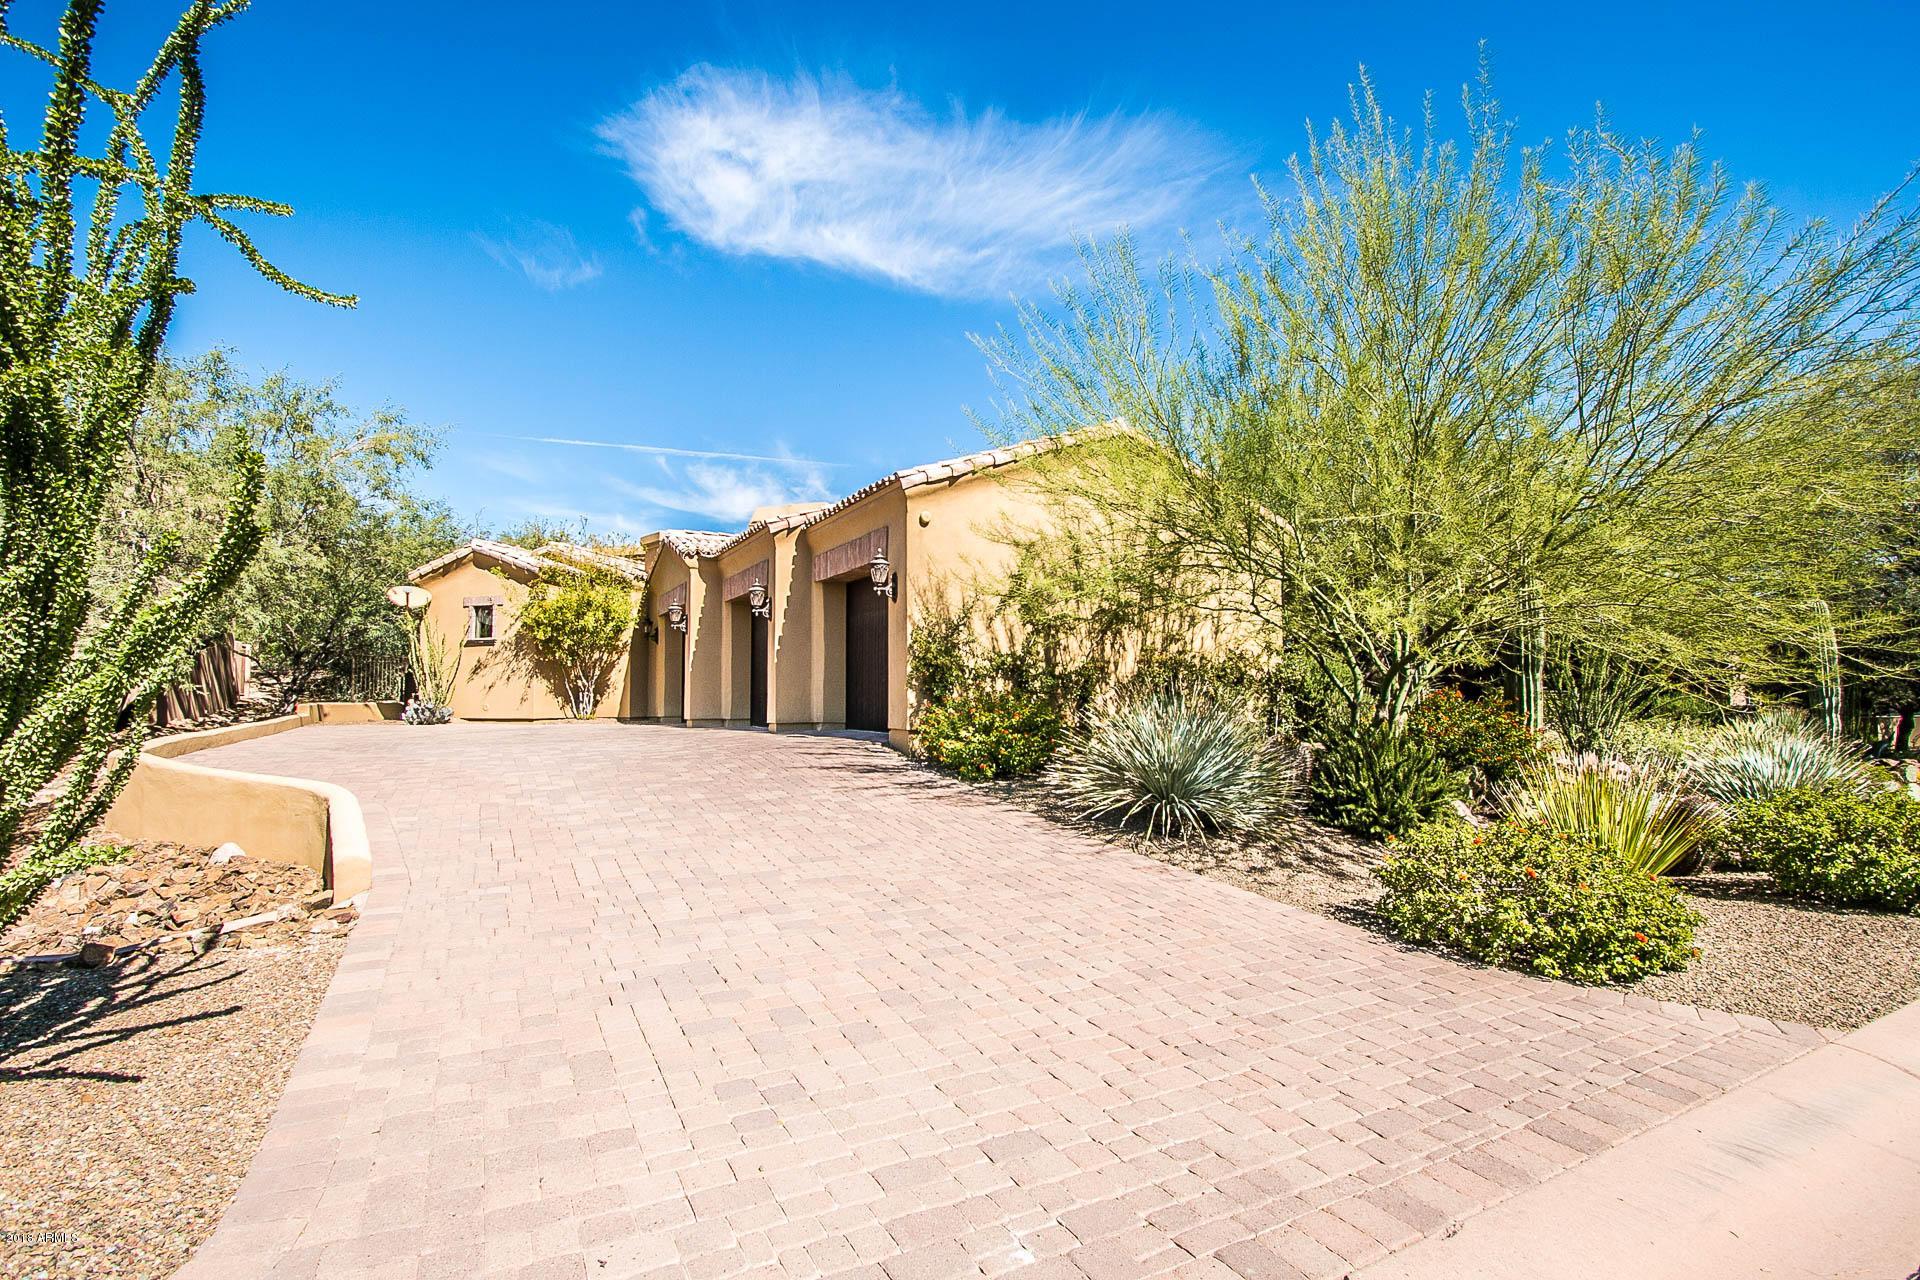 MLS 5831441 11440 E CHAMA Road, Scottsdale, AZ 85255 Scottsdale AZ Troon Village